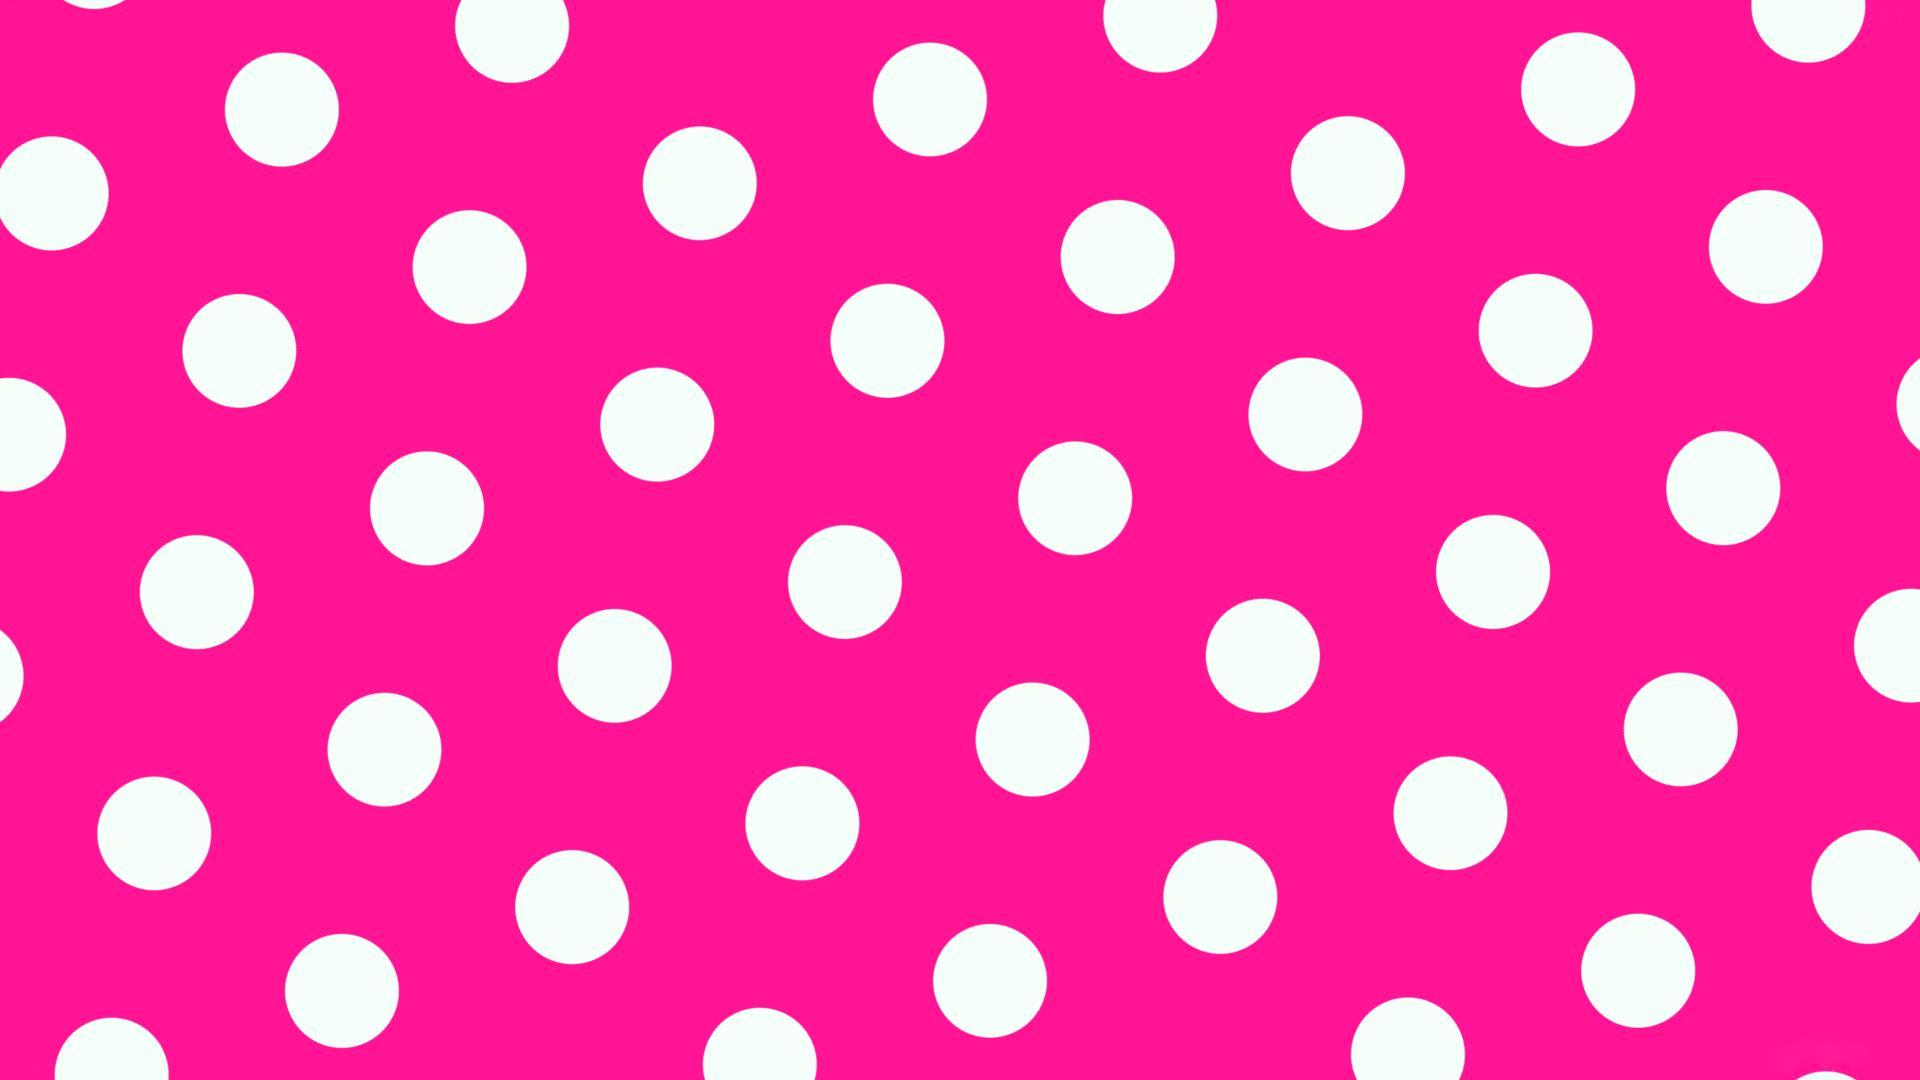 Free download dot backgrounds pixelstalk net for Polka dot wallpaper